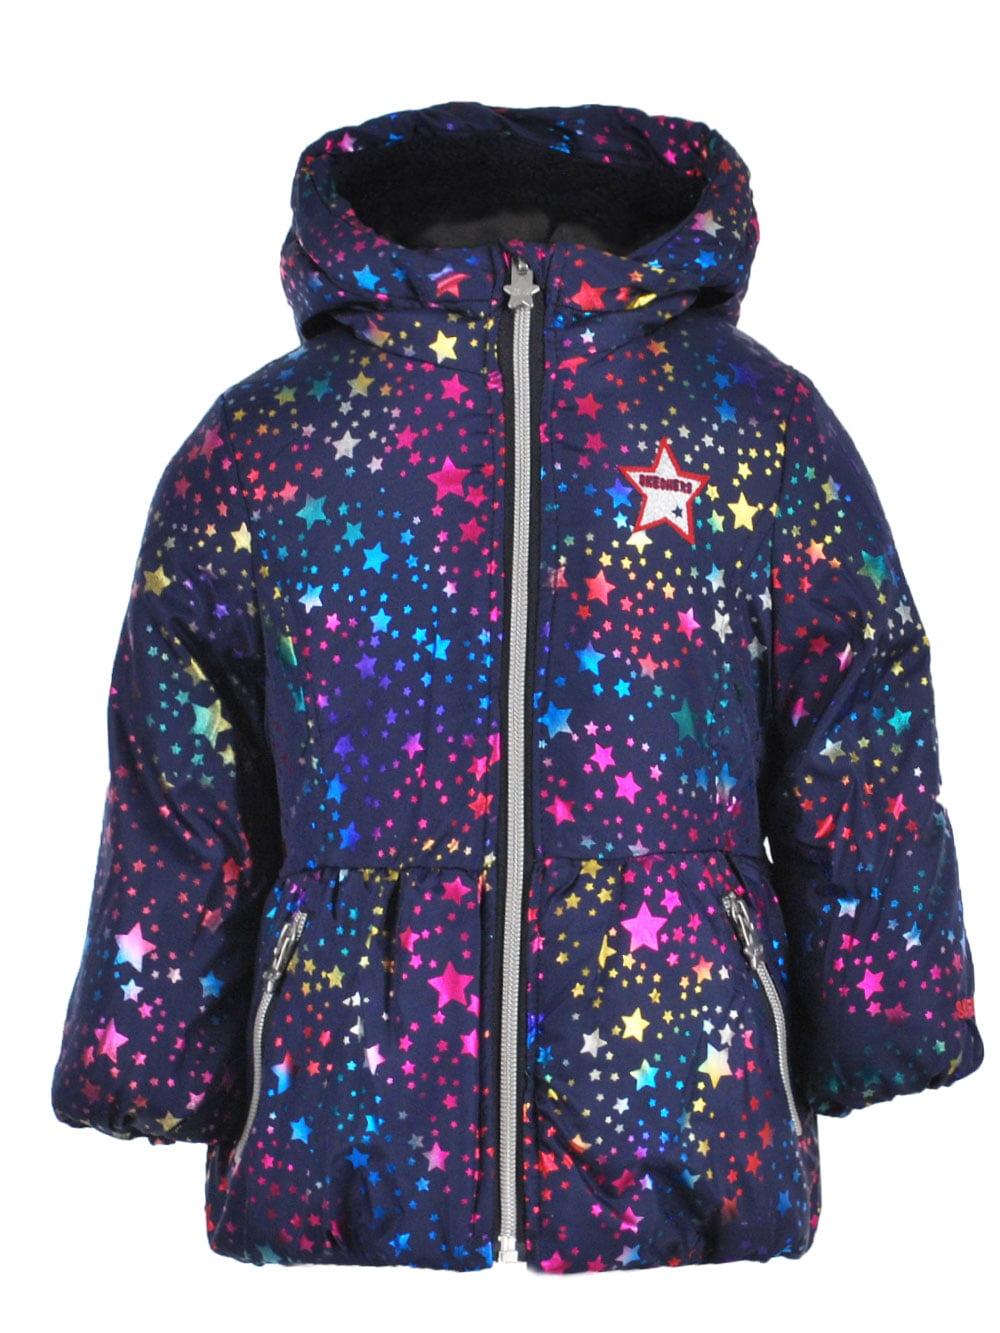 Skechers Baby Girls' Insulated Jacket